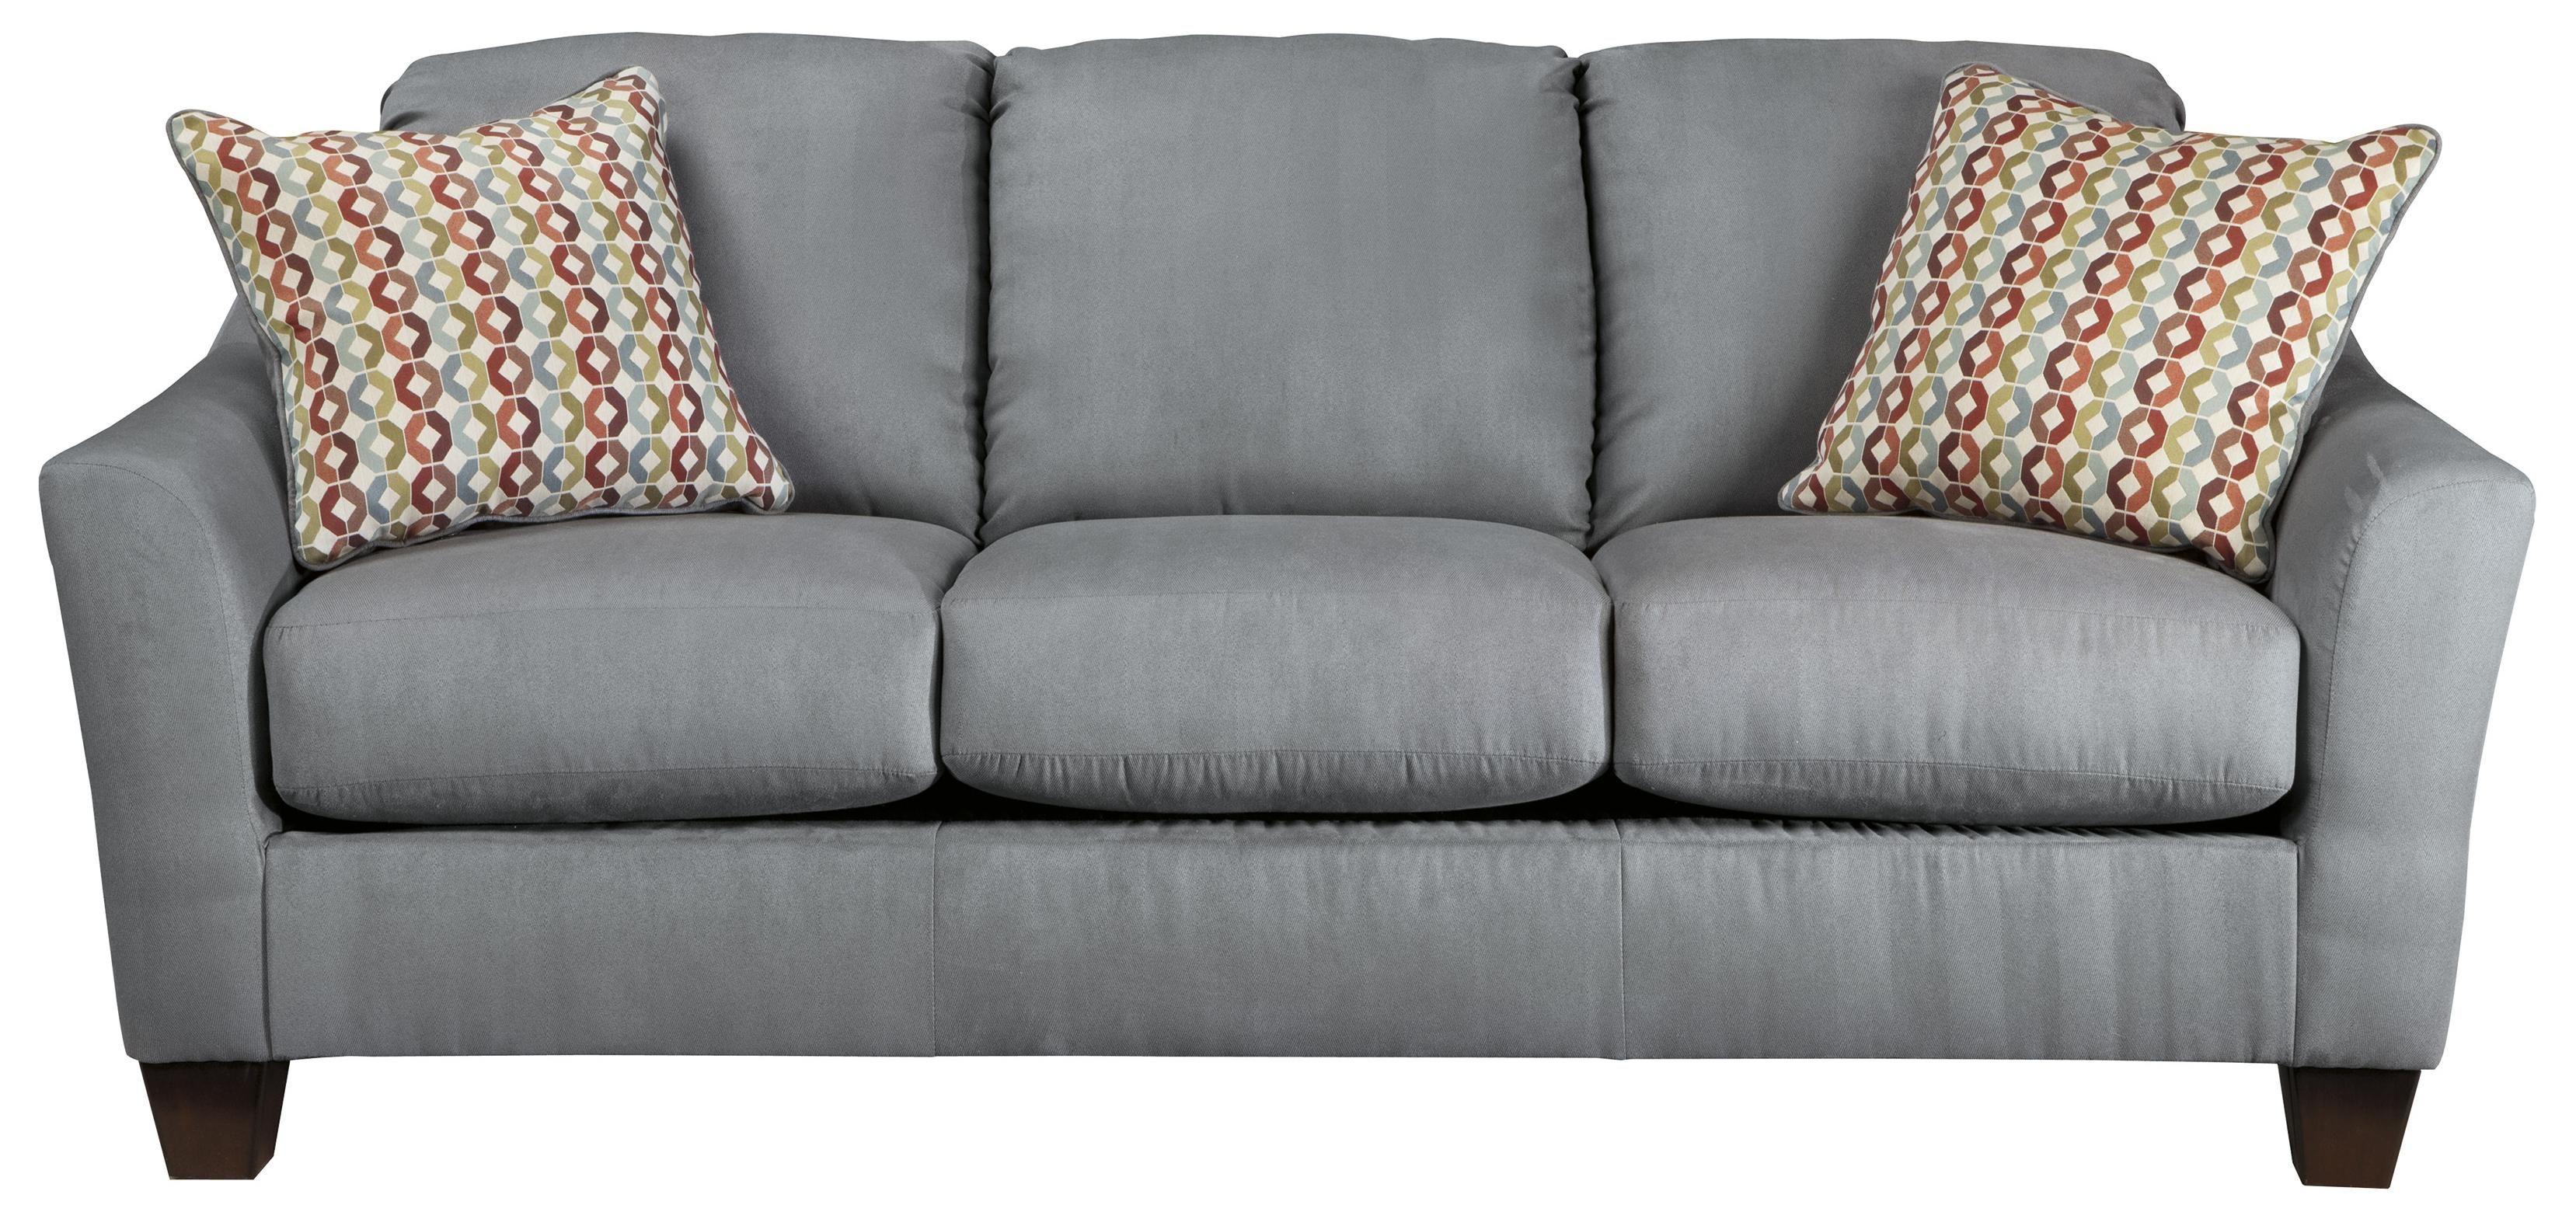 Hannin Lagoon Queen Sofa Sleeper by Signature Design by